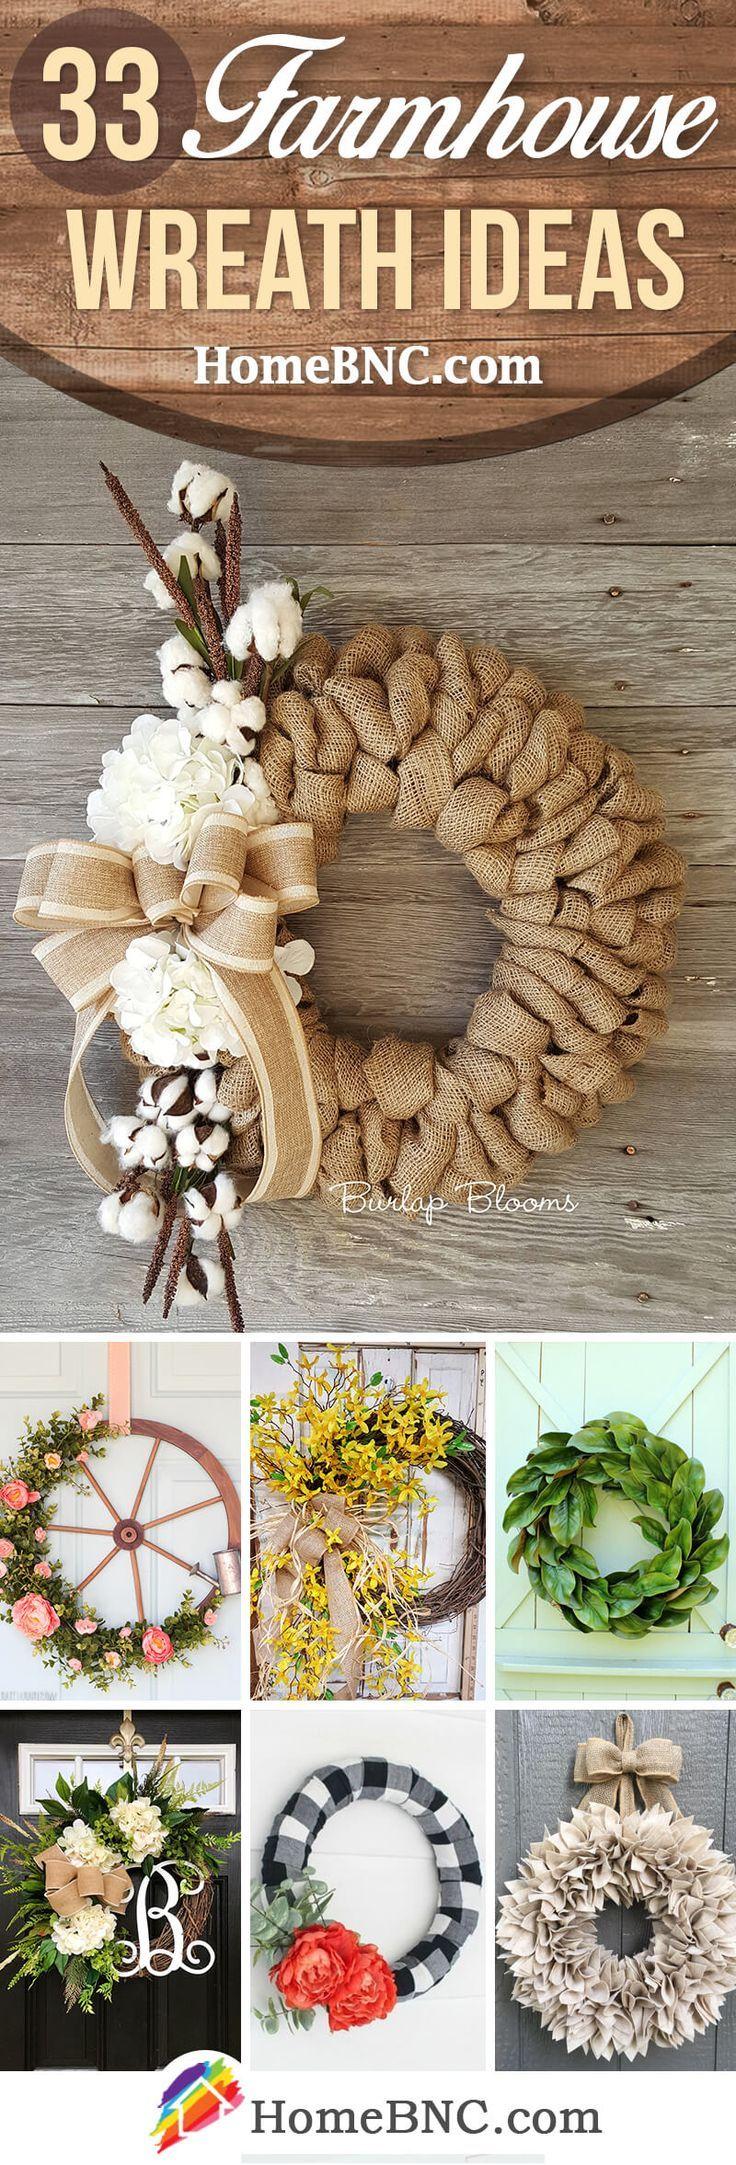 33 Natural Rustic Farmhouse Wreath Ideas To Welcome Guests With Style Farmhouse Wreath Diy Farmhouse Wreath Diy Wreath